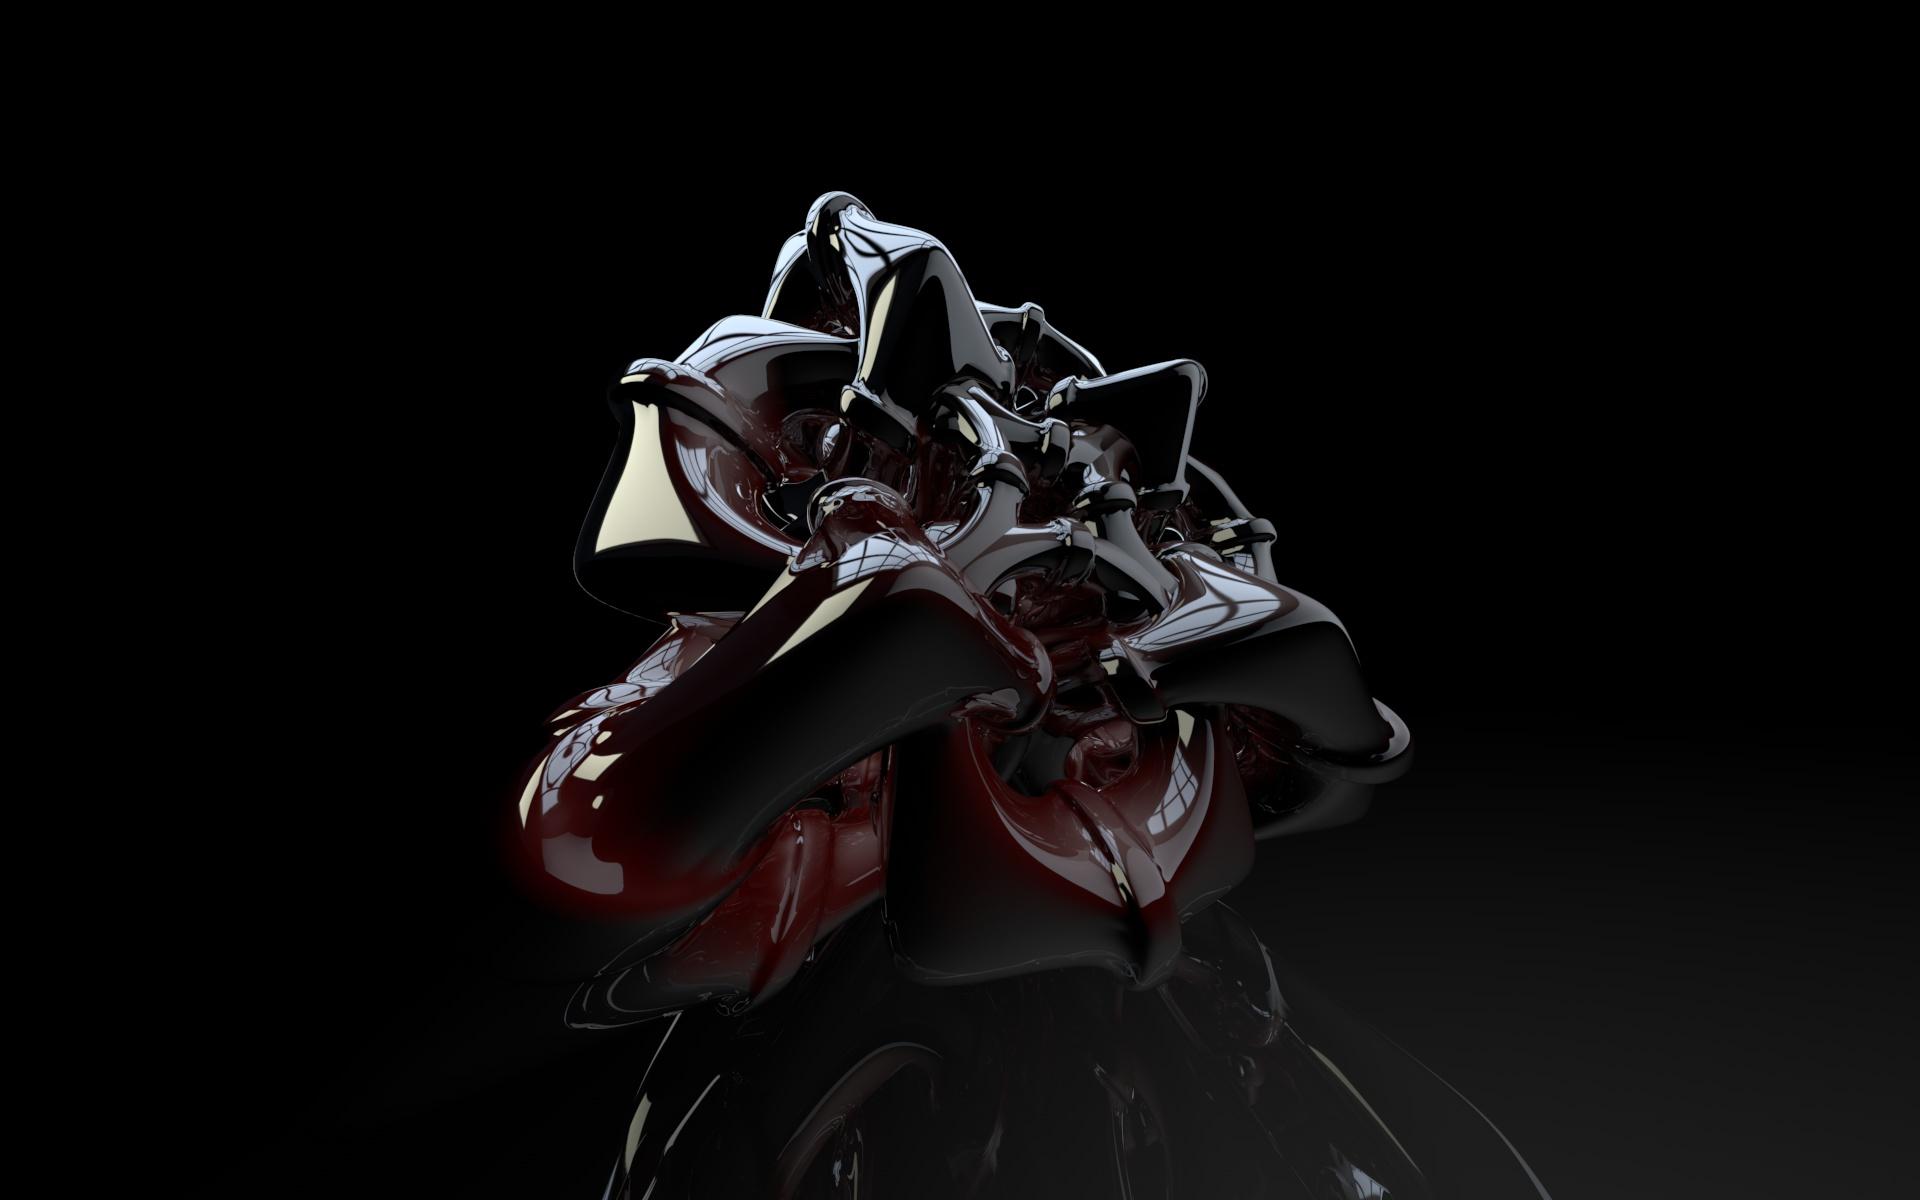 Cube C4D by KRYPT06